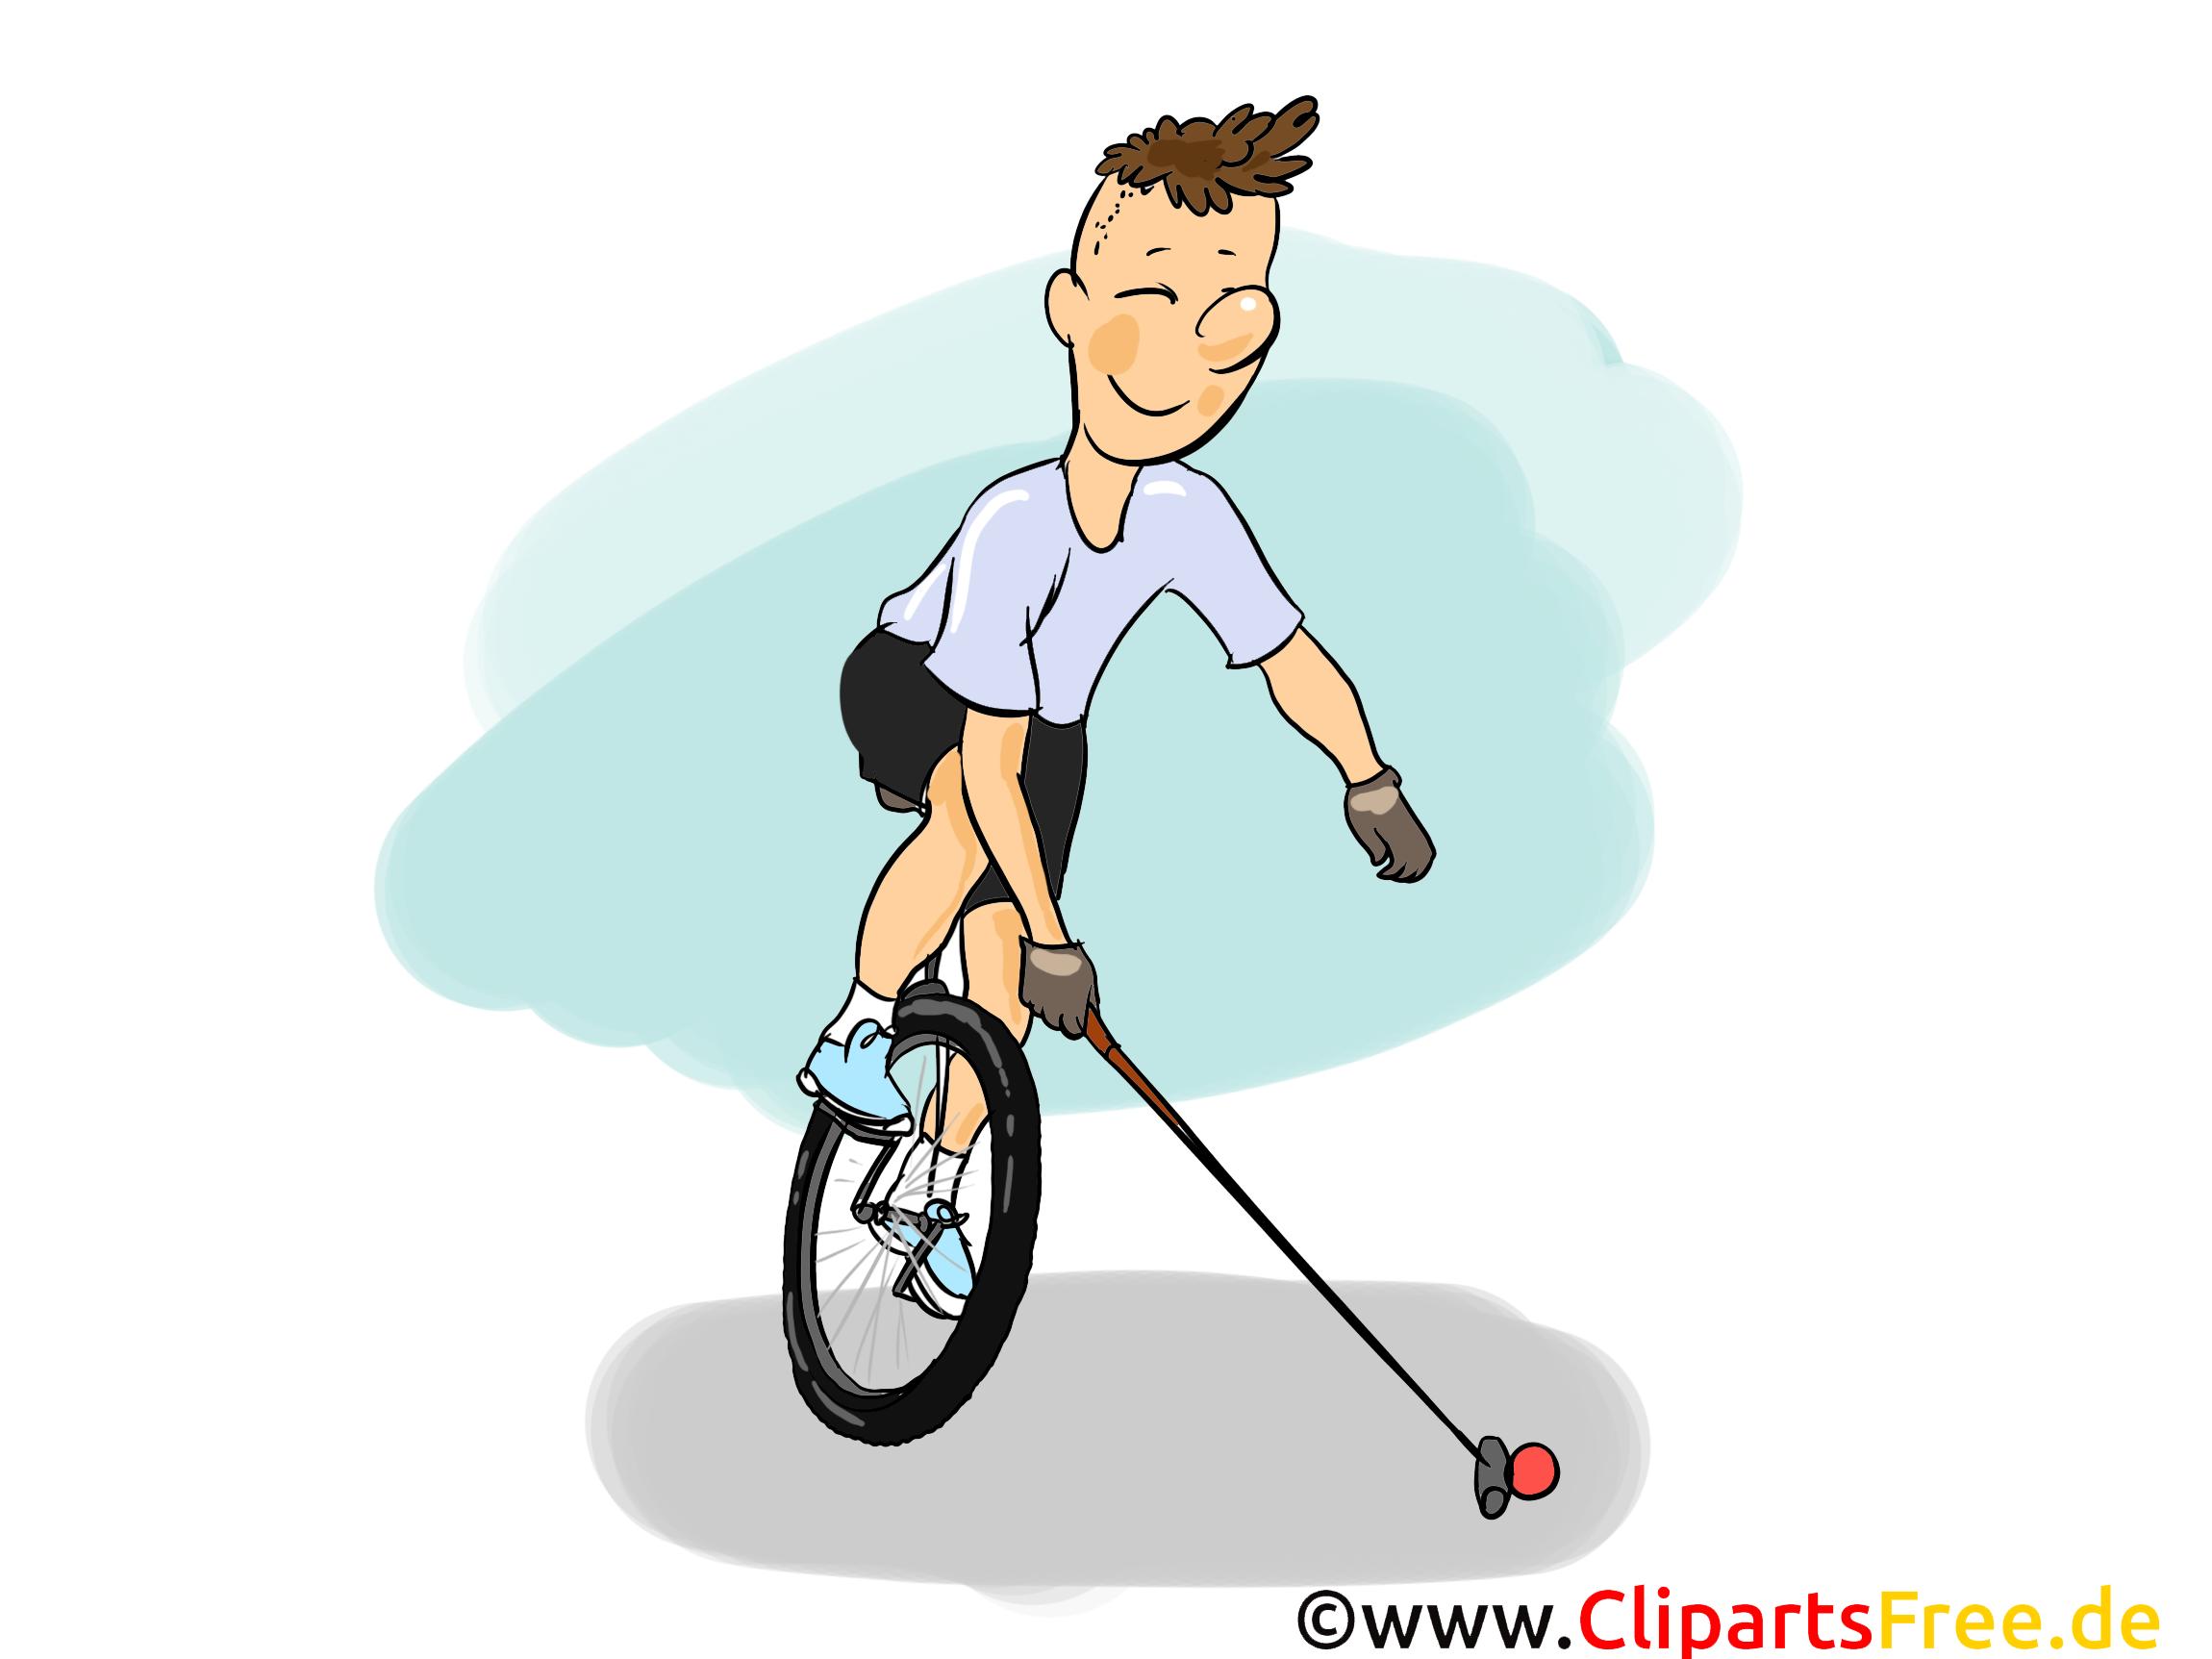 Bisiklet topu Polo illüstrasyon, çizgi film, küçük resim, resim, çizgi roman